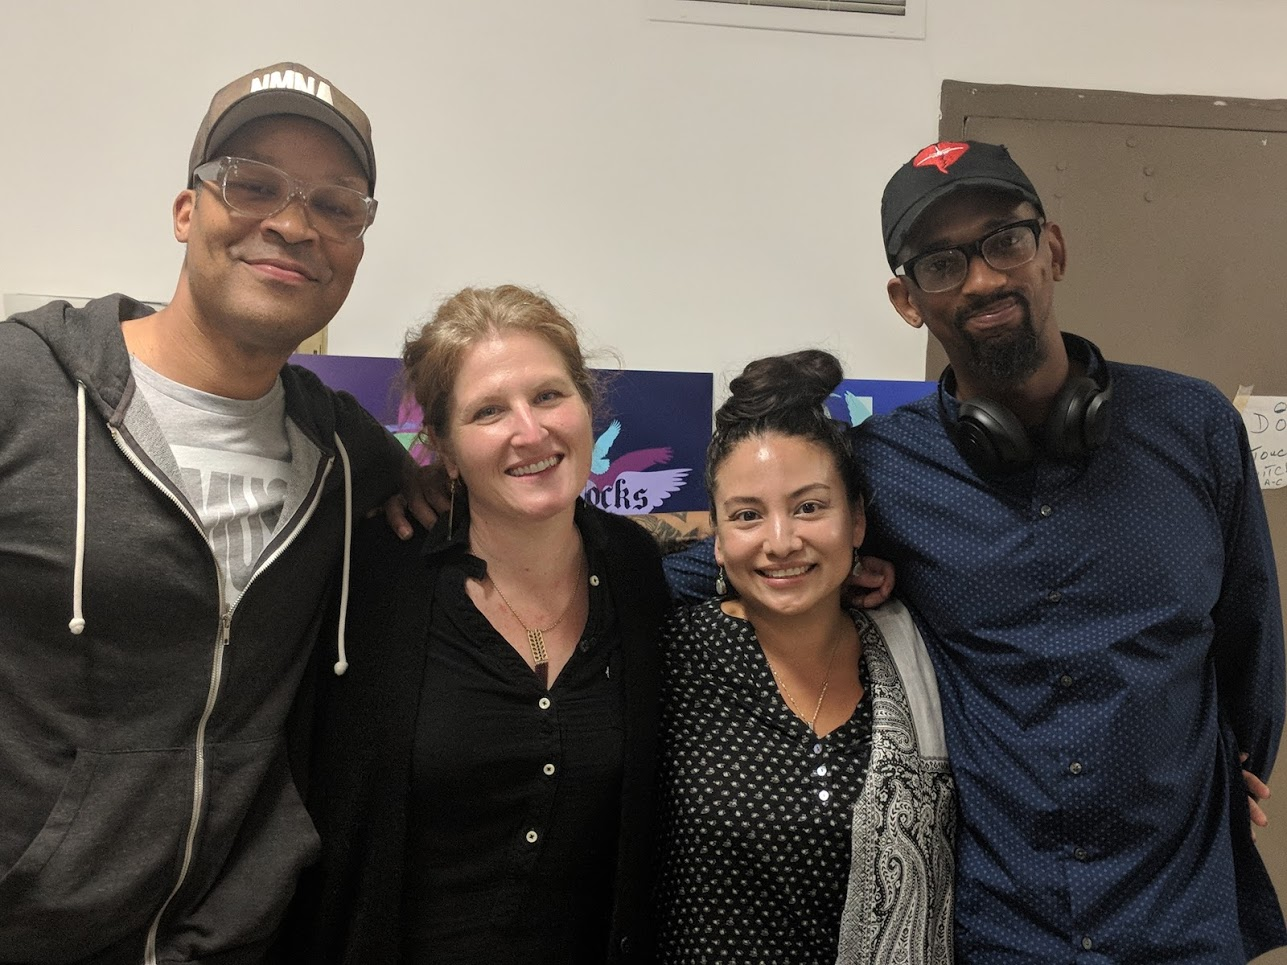 Meet The Muralists (from left): Rah Crawford,Ellie Balk,Gera Lanzo and Flako Jimenez